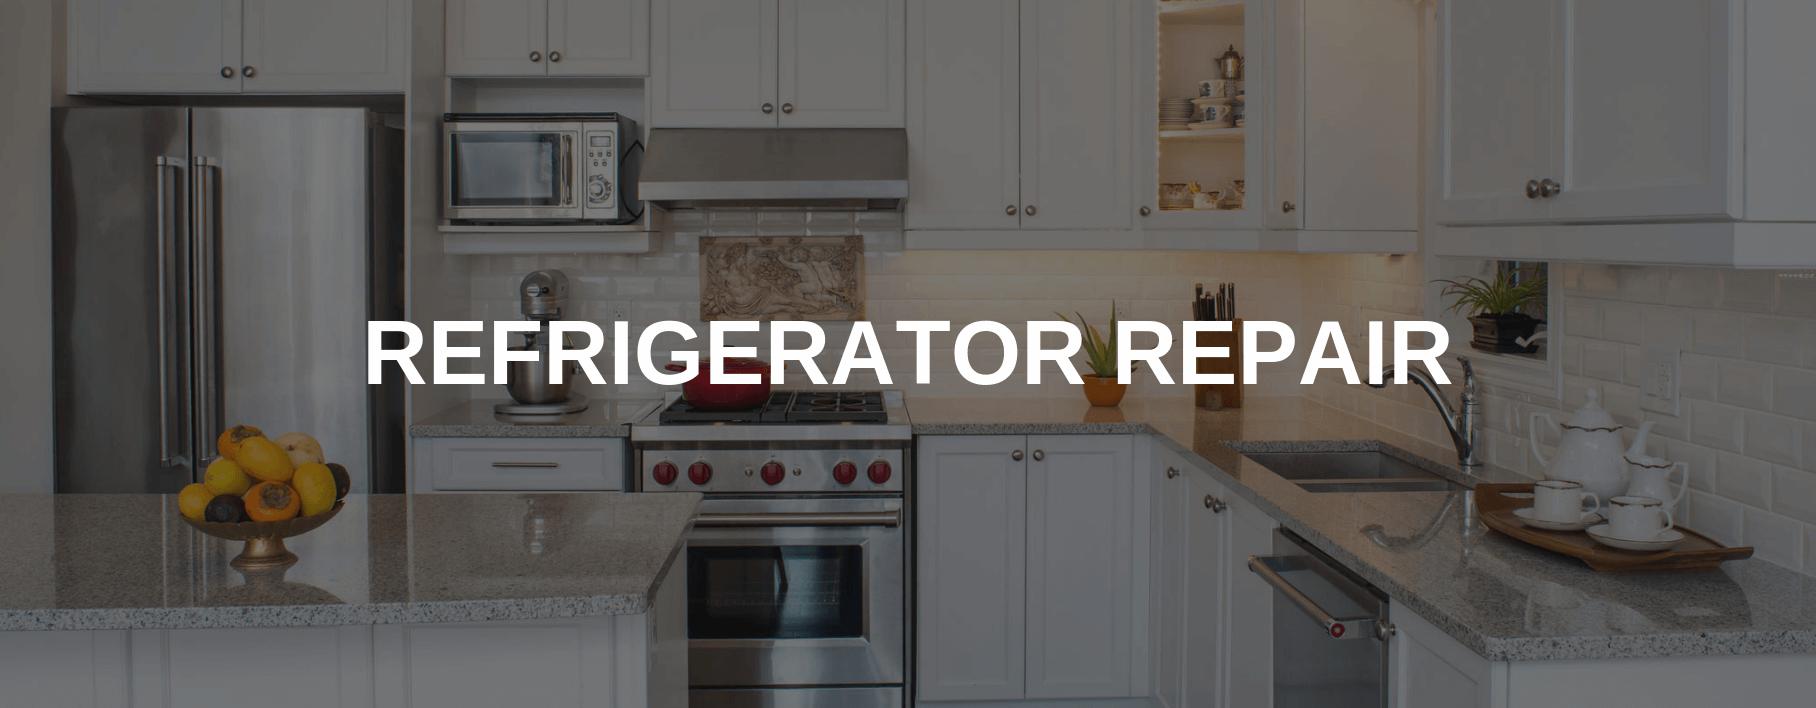 elizabeth refrigerator repair